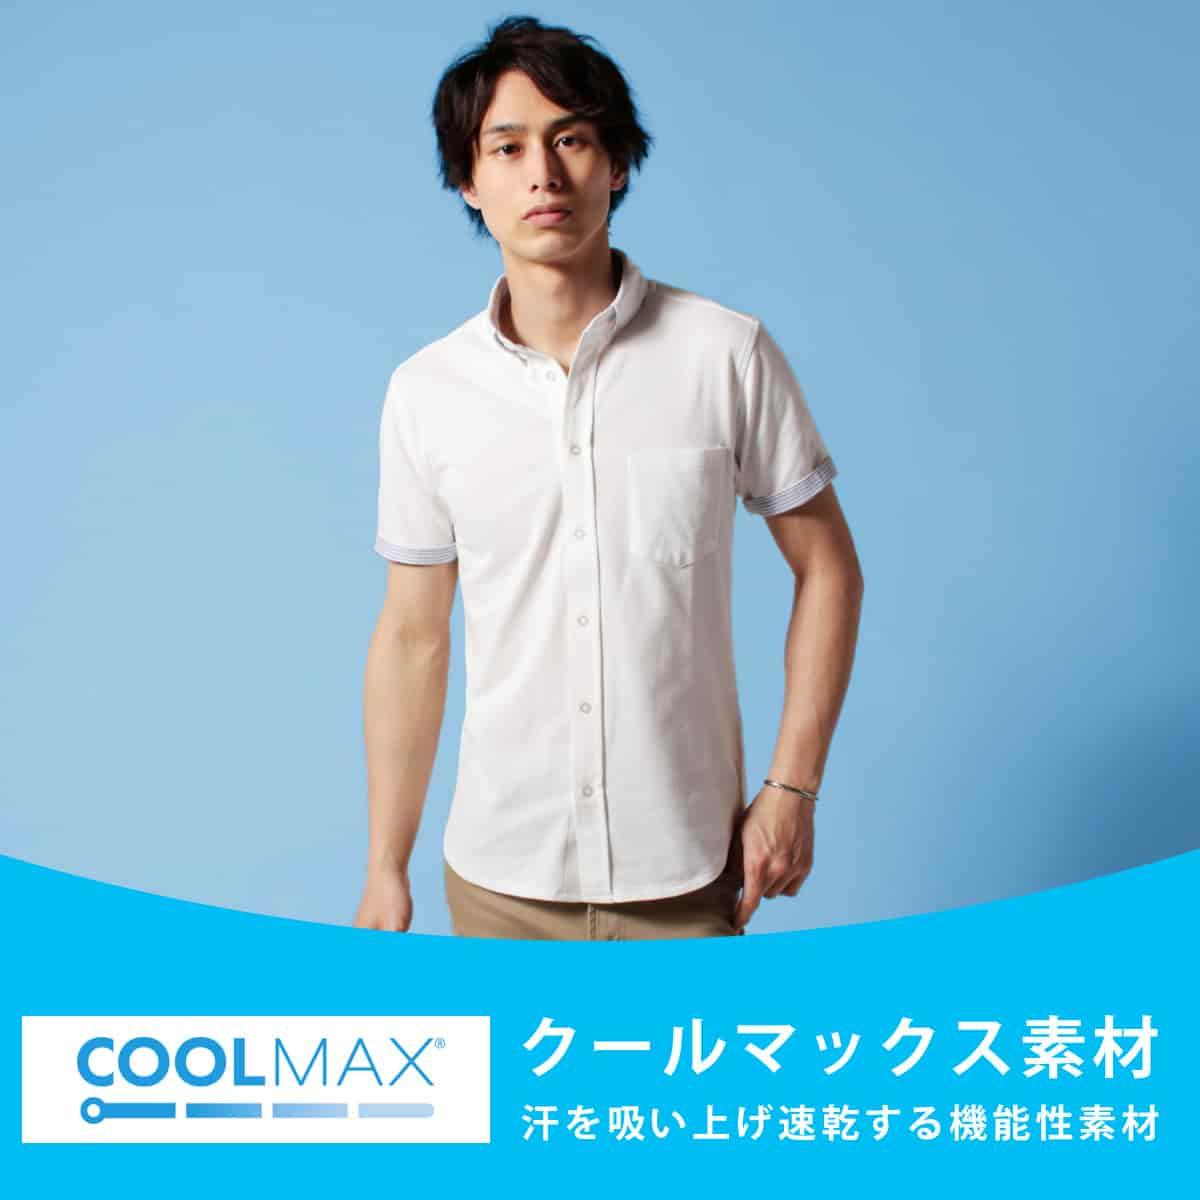 COOLMAX(クールマックス)